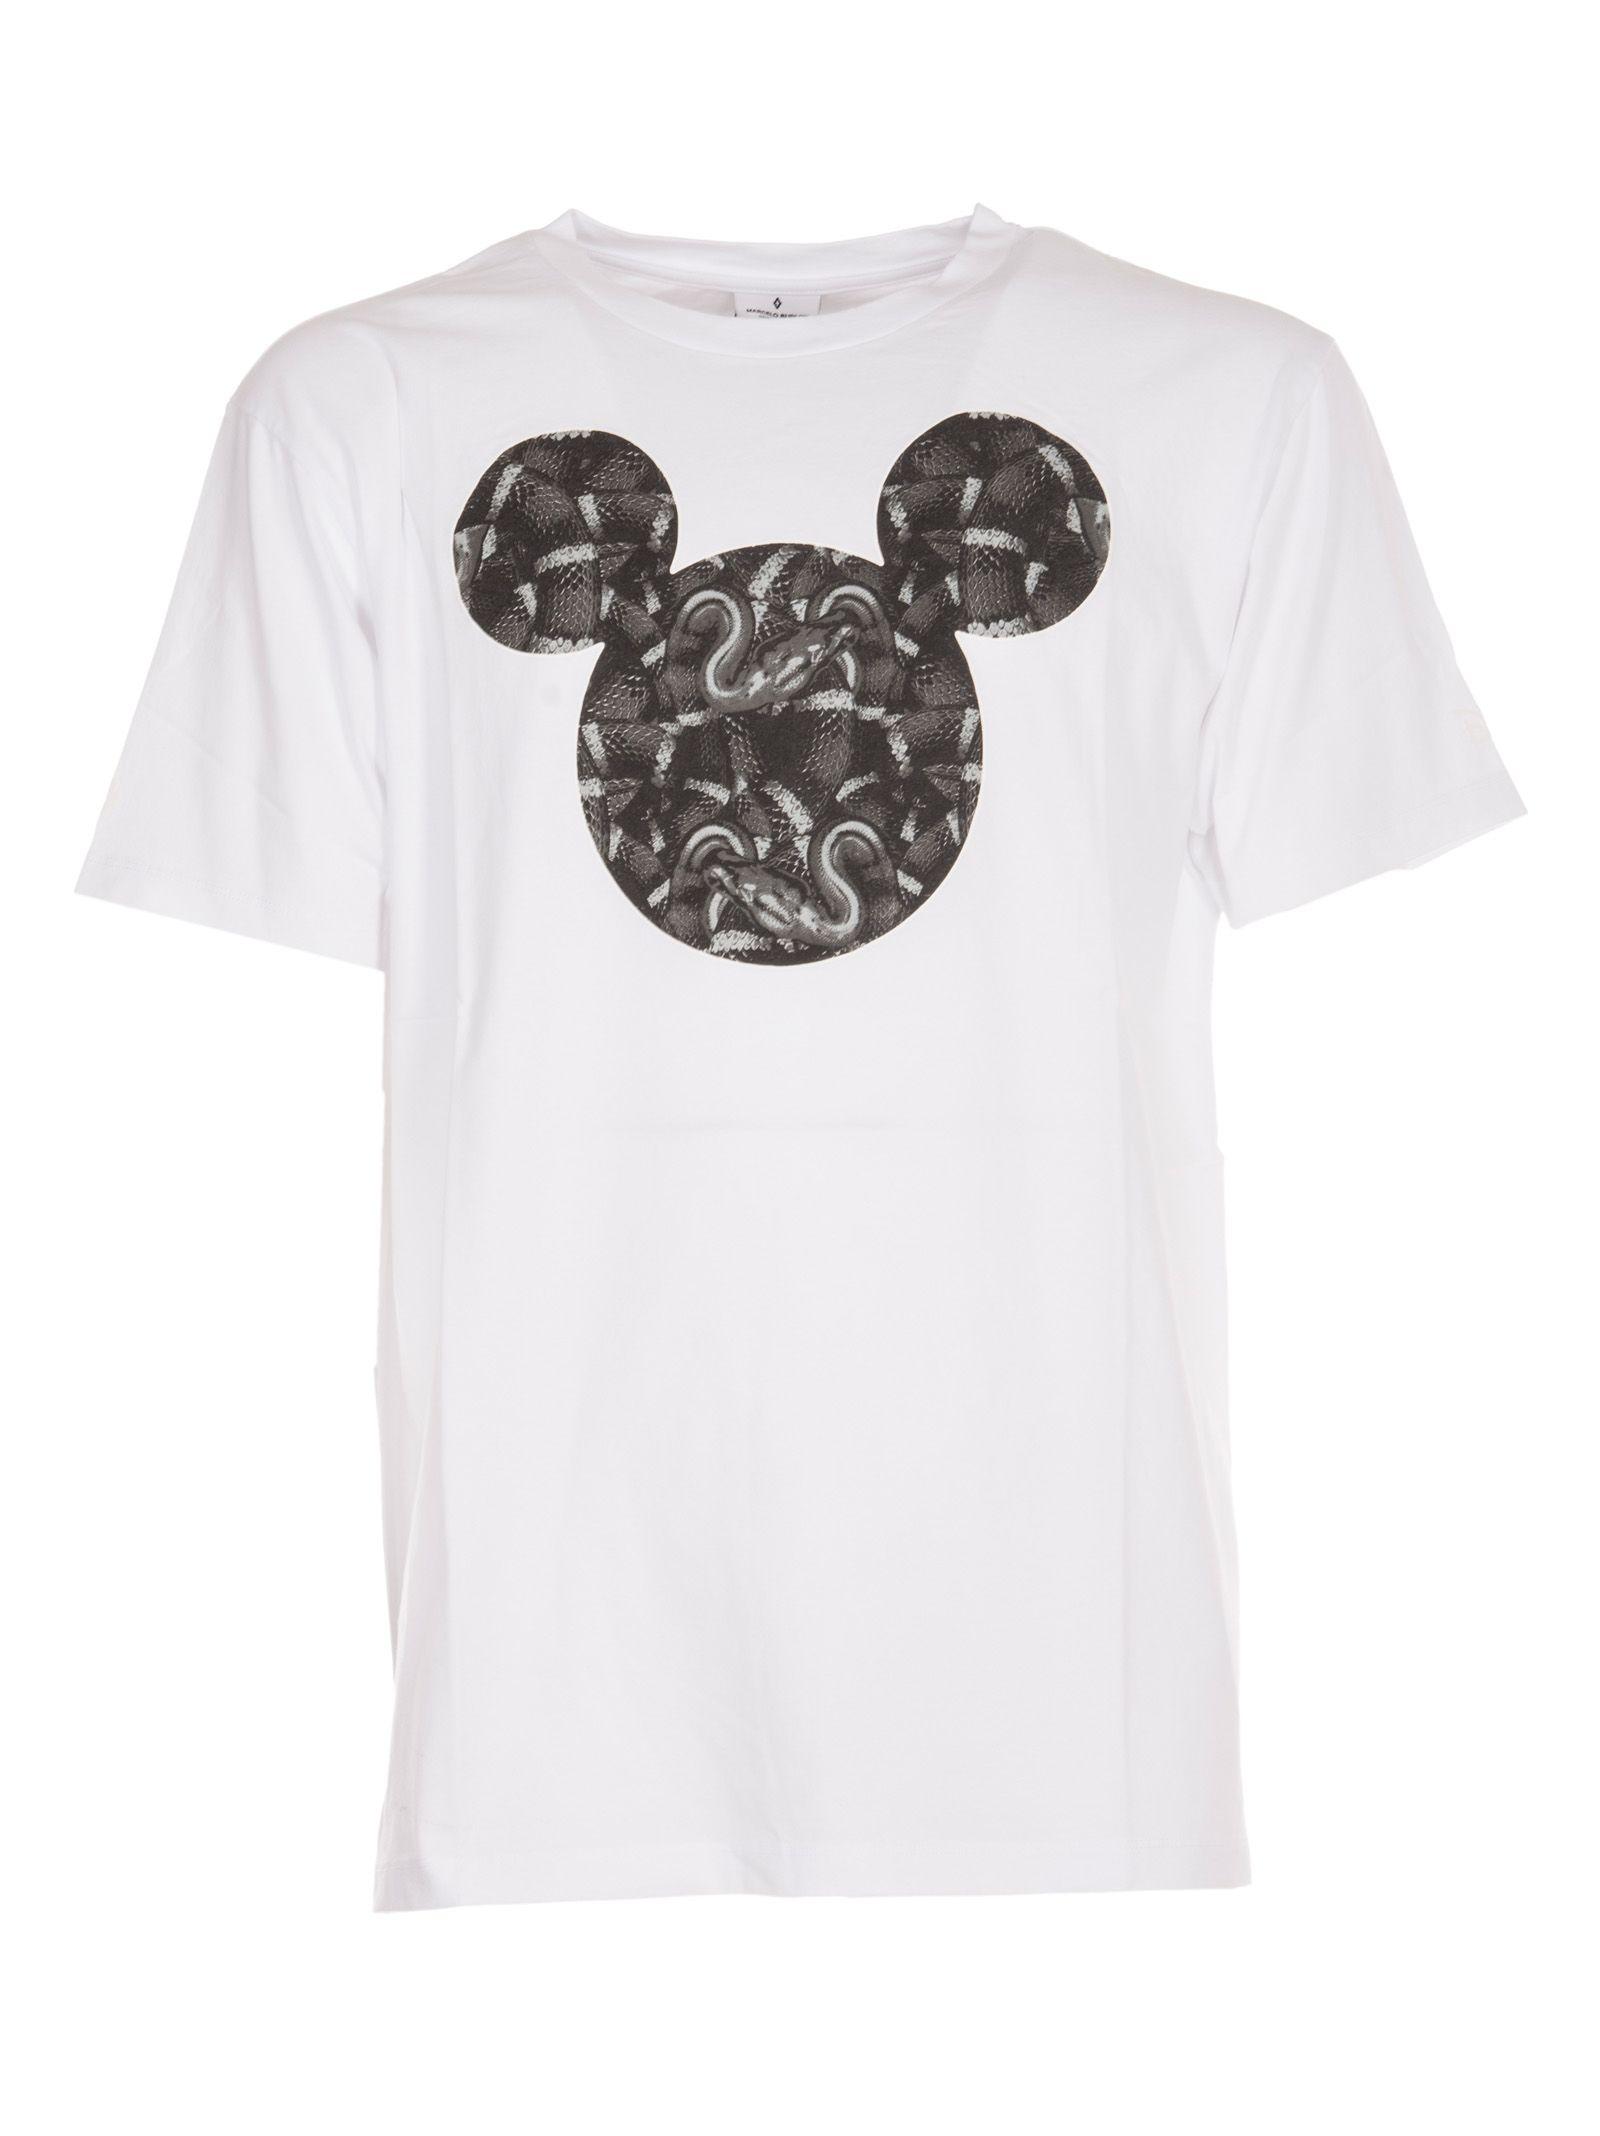 Marcelo Burlon Mickey Mouse Snakes T-shirt